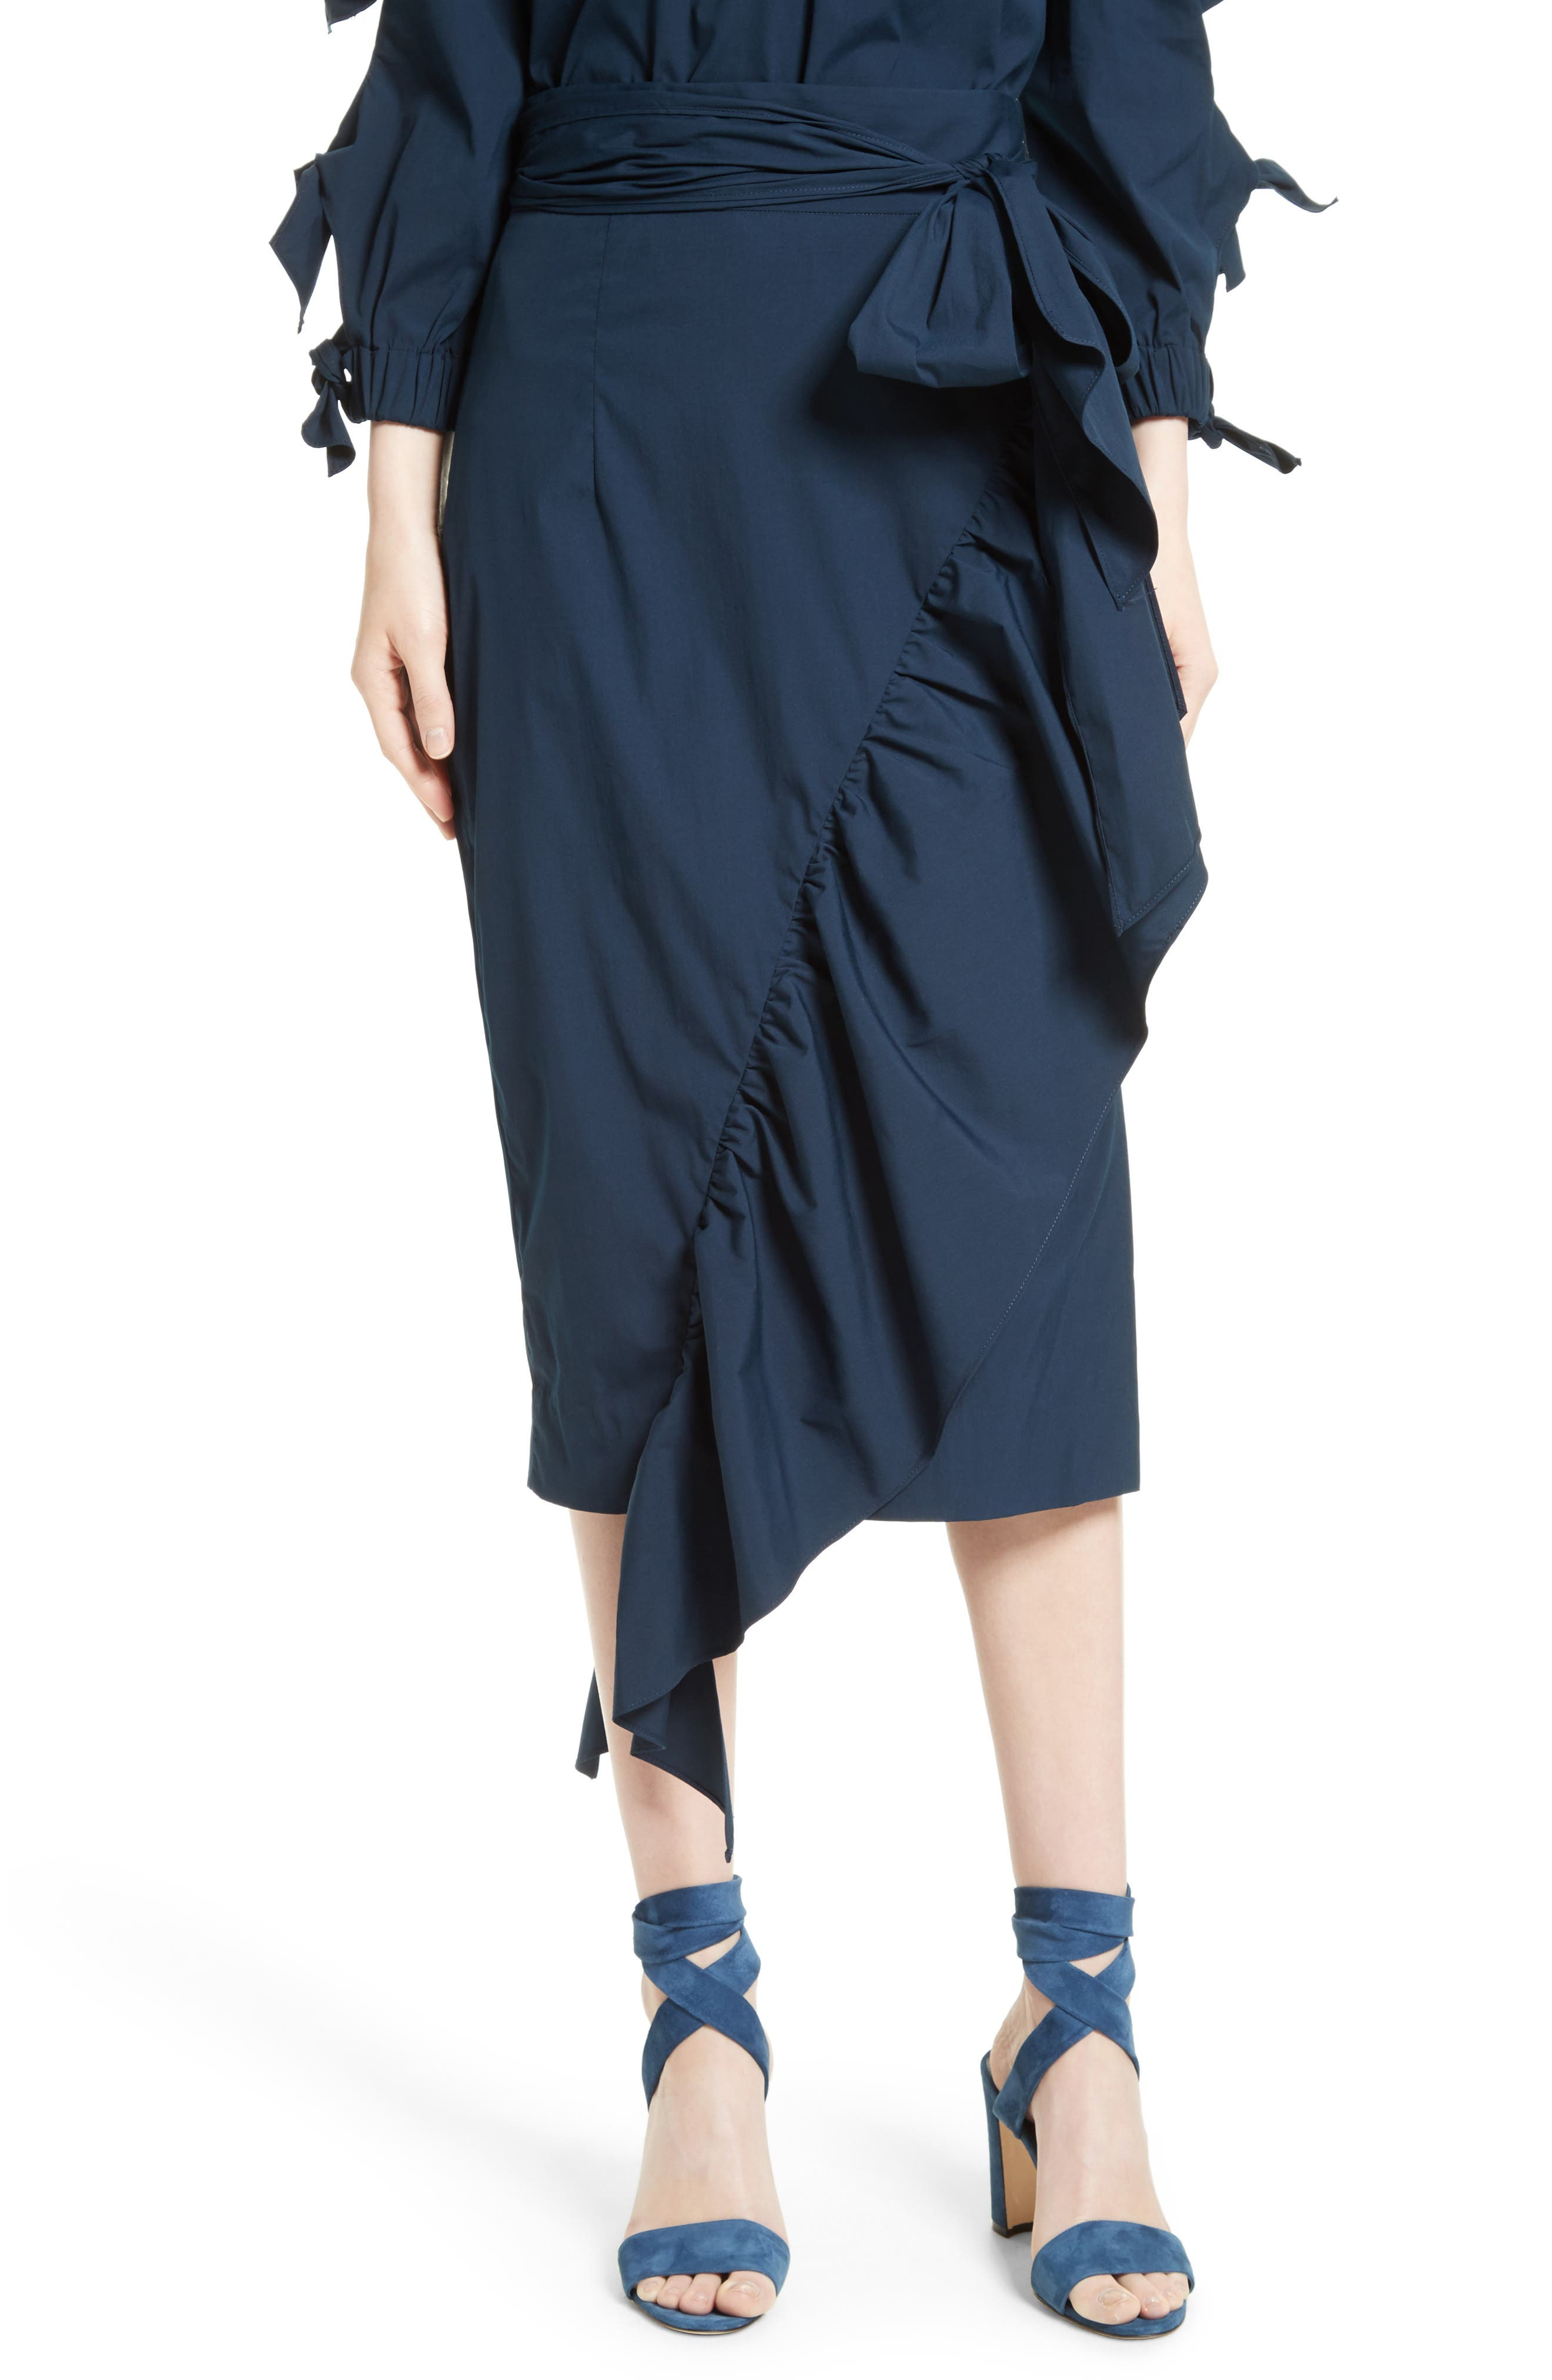 Milly Ruffled Stretch Poplin Skirt